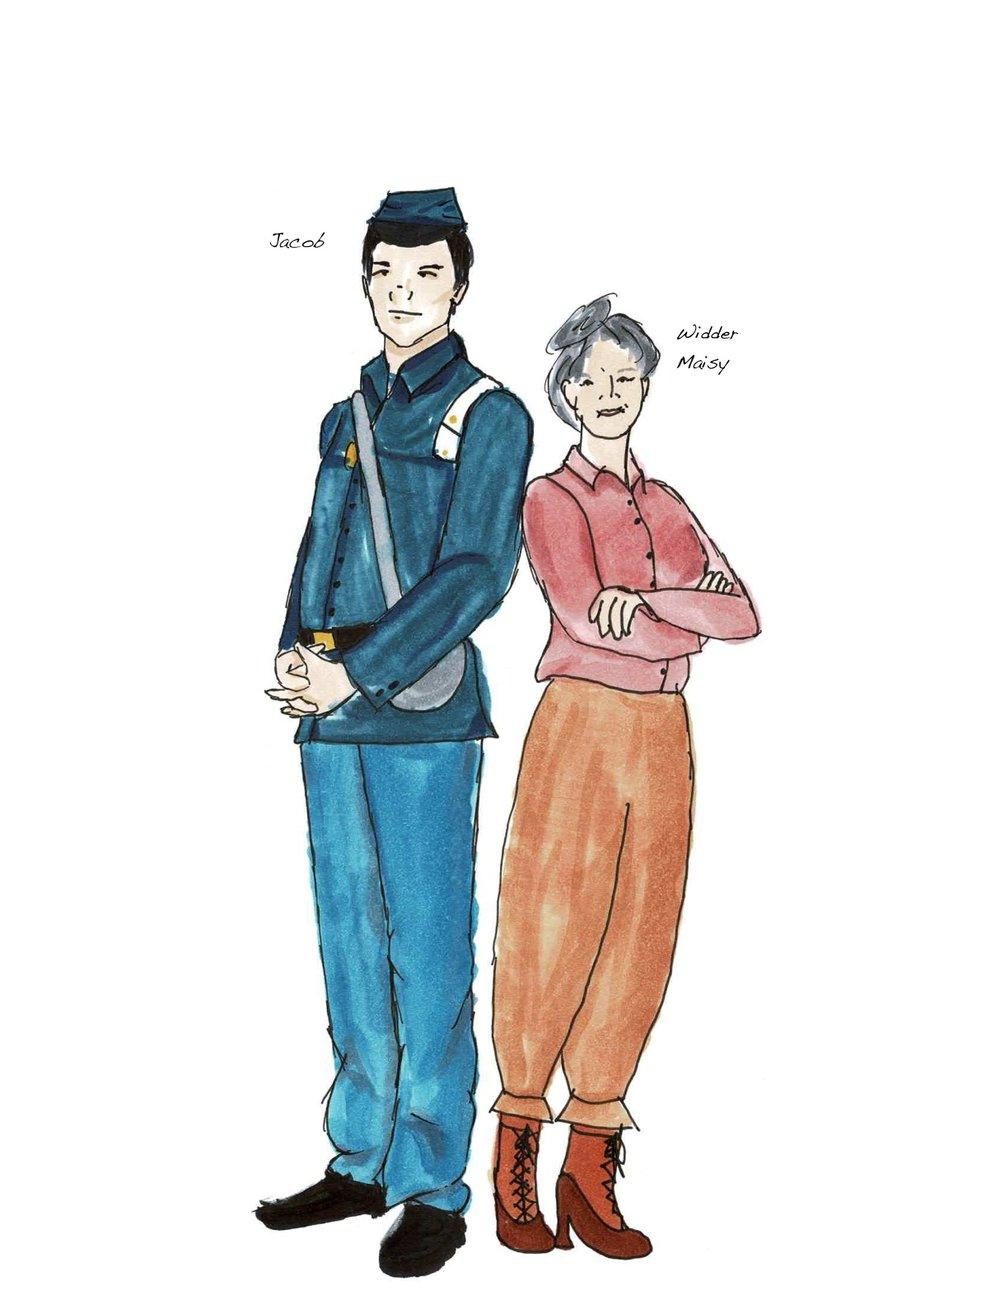 Jacob and Widder-001.jpg